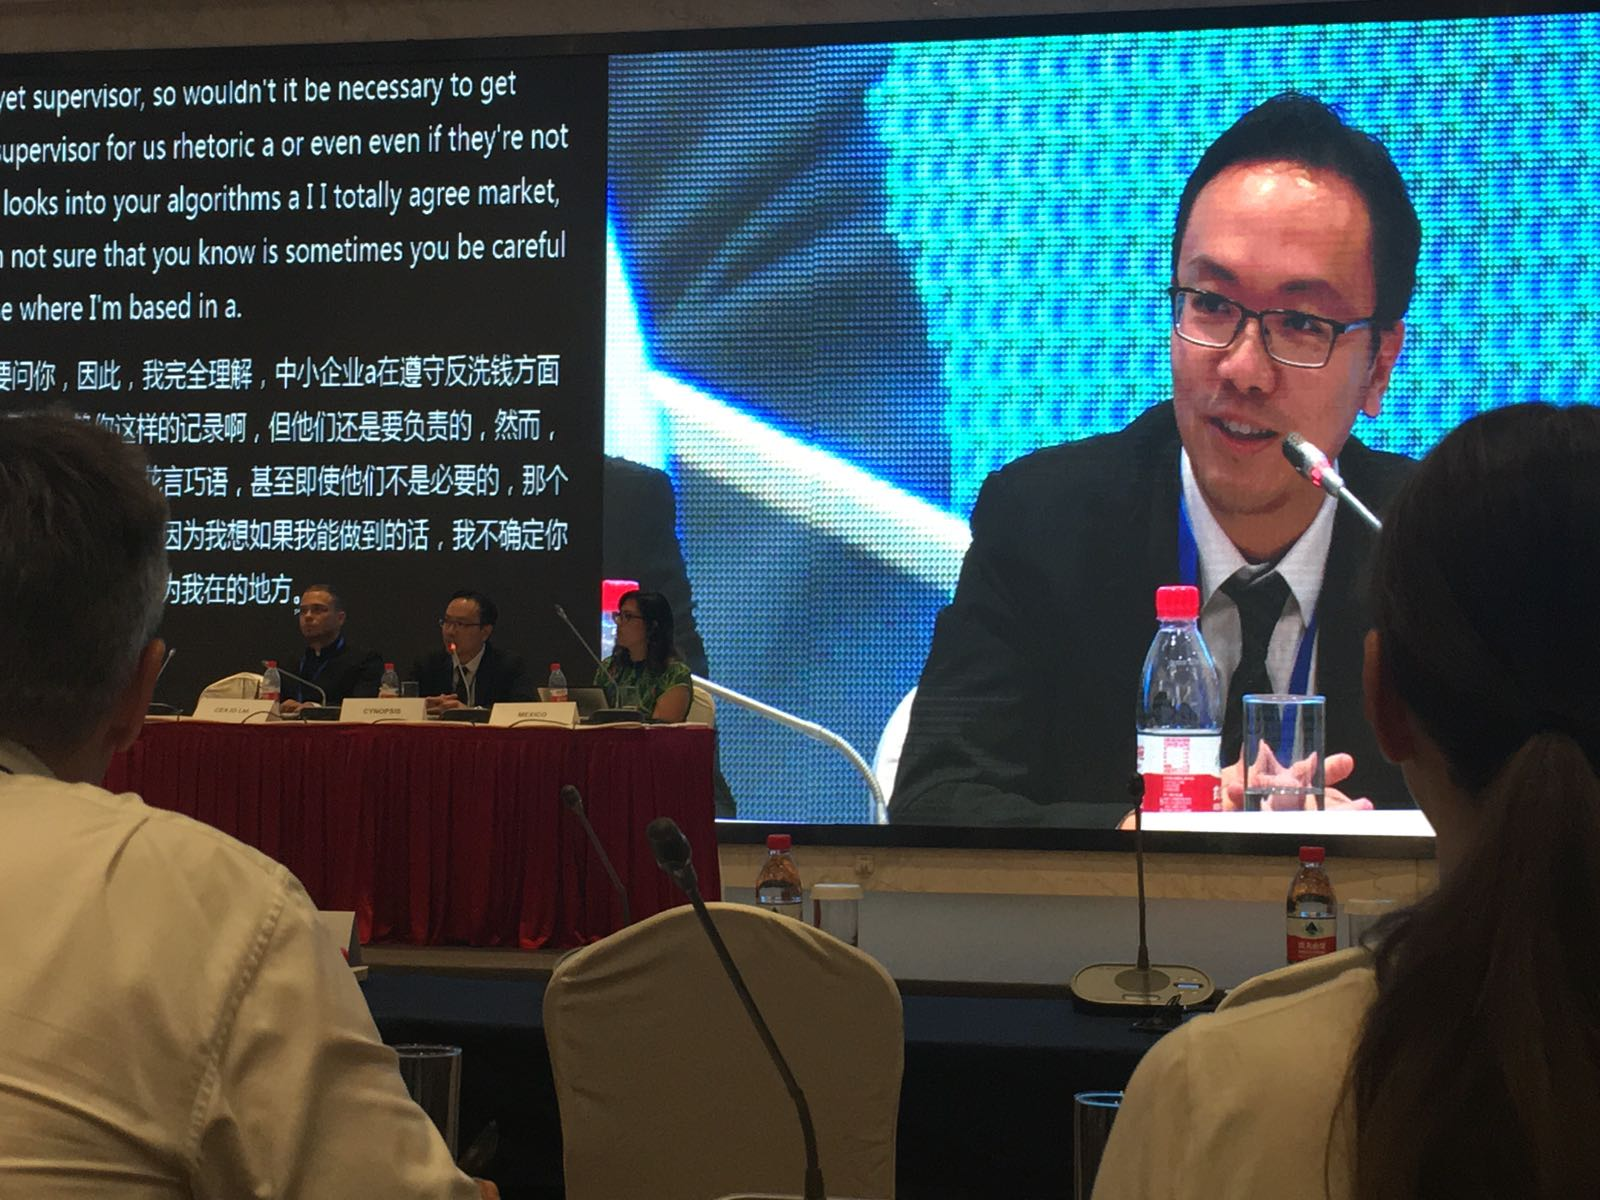 Chye Kit speaking at the forum